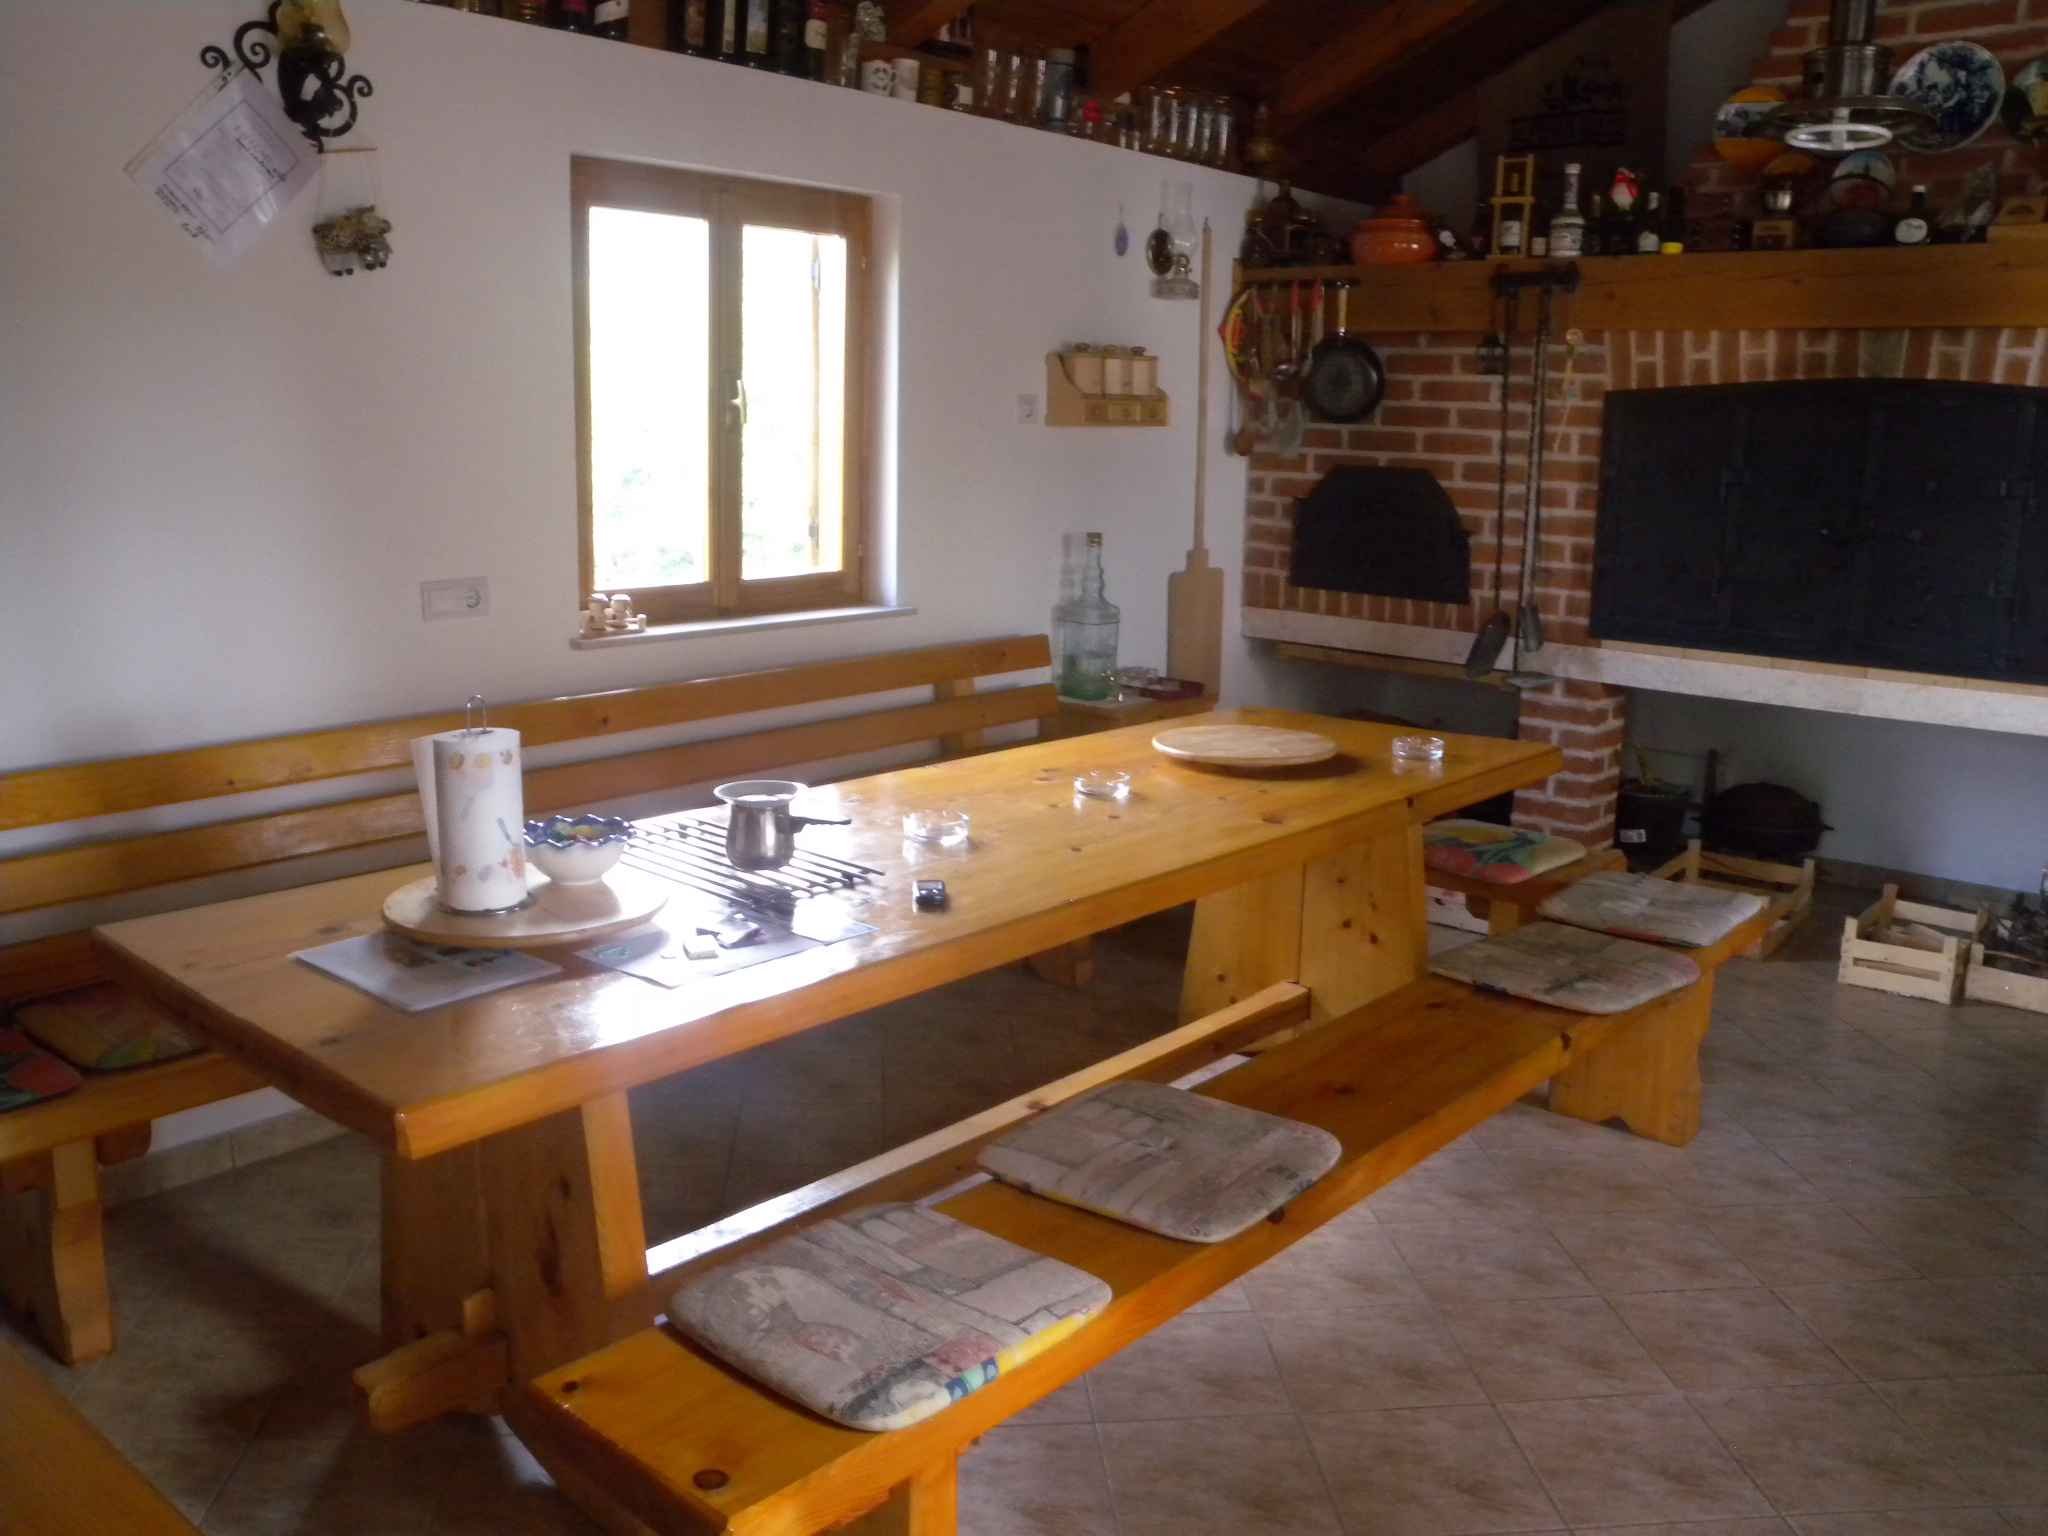 Appartement de vacances s ljetnom kuhinjom i bazenom (648047), Grižane, , Kvarner, Croatie, image 13